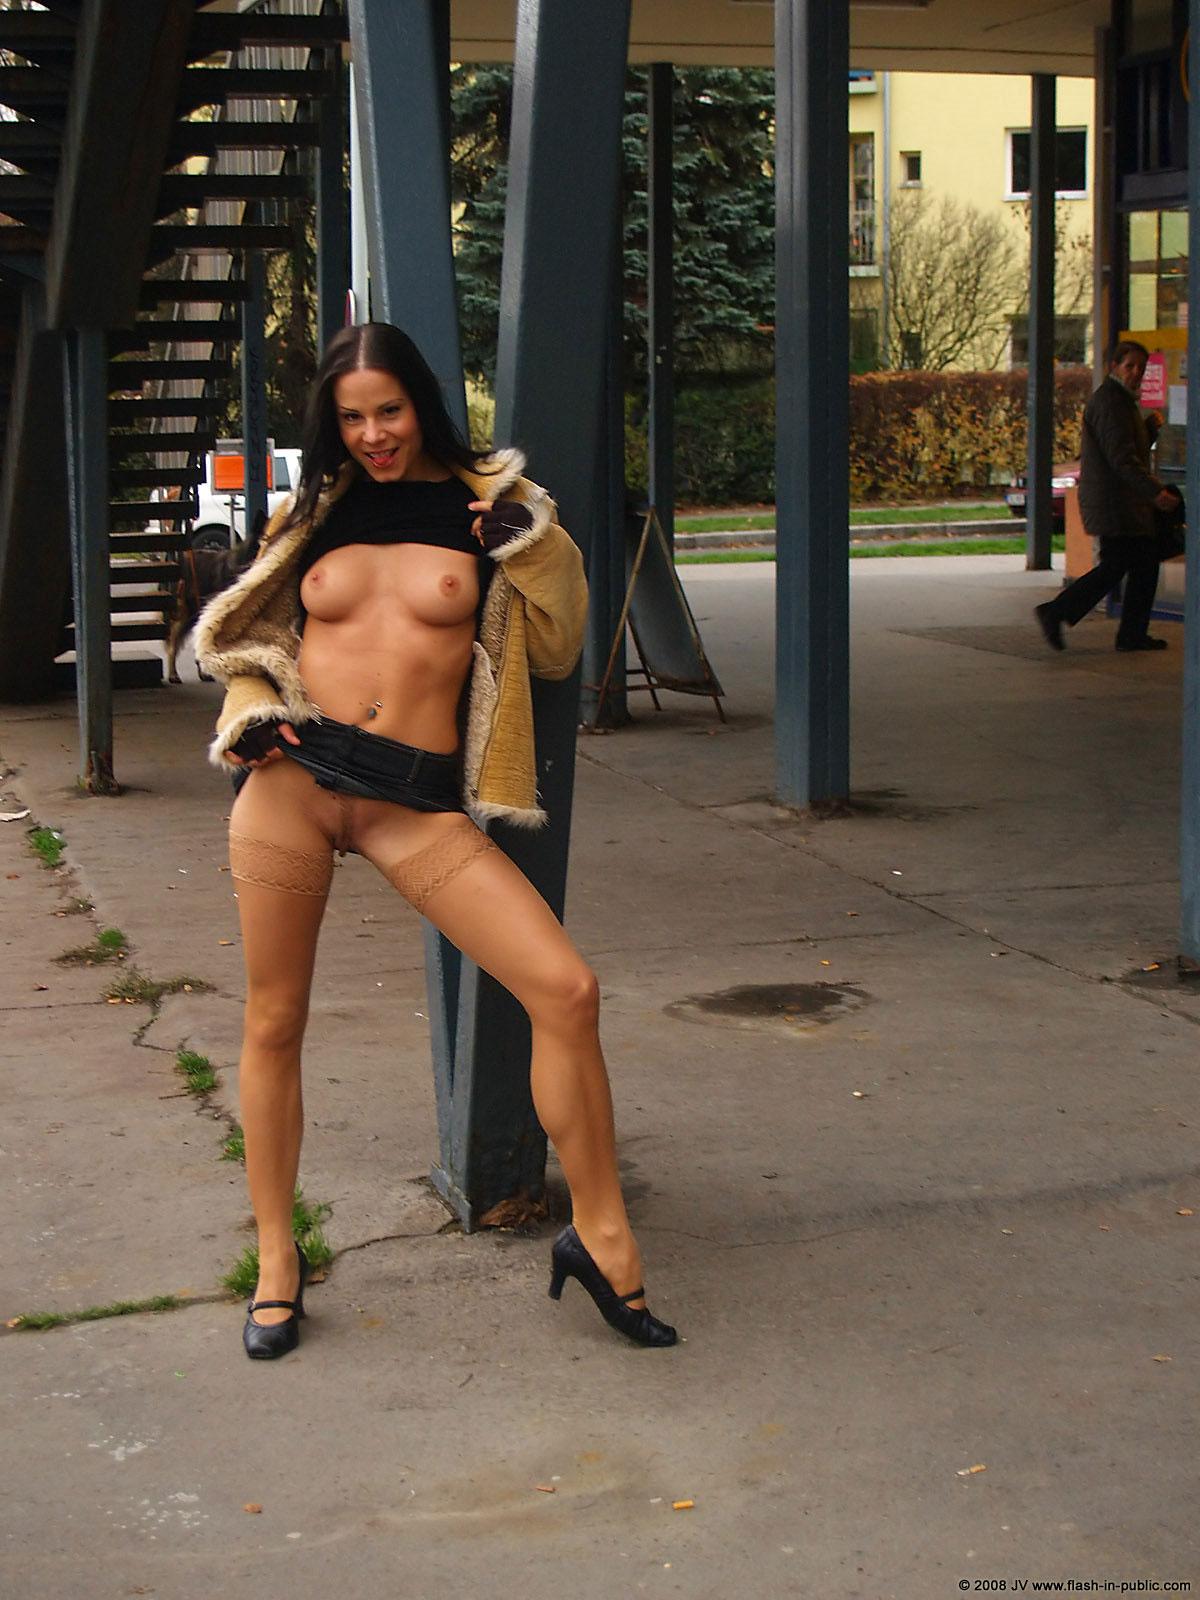 alexandra-g-bottomless-stockings-flash-in-public-20